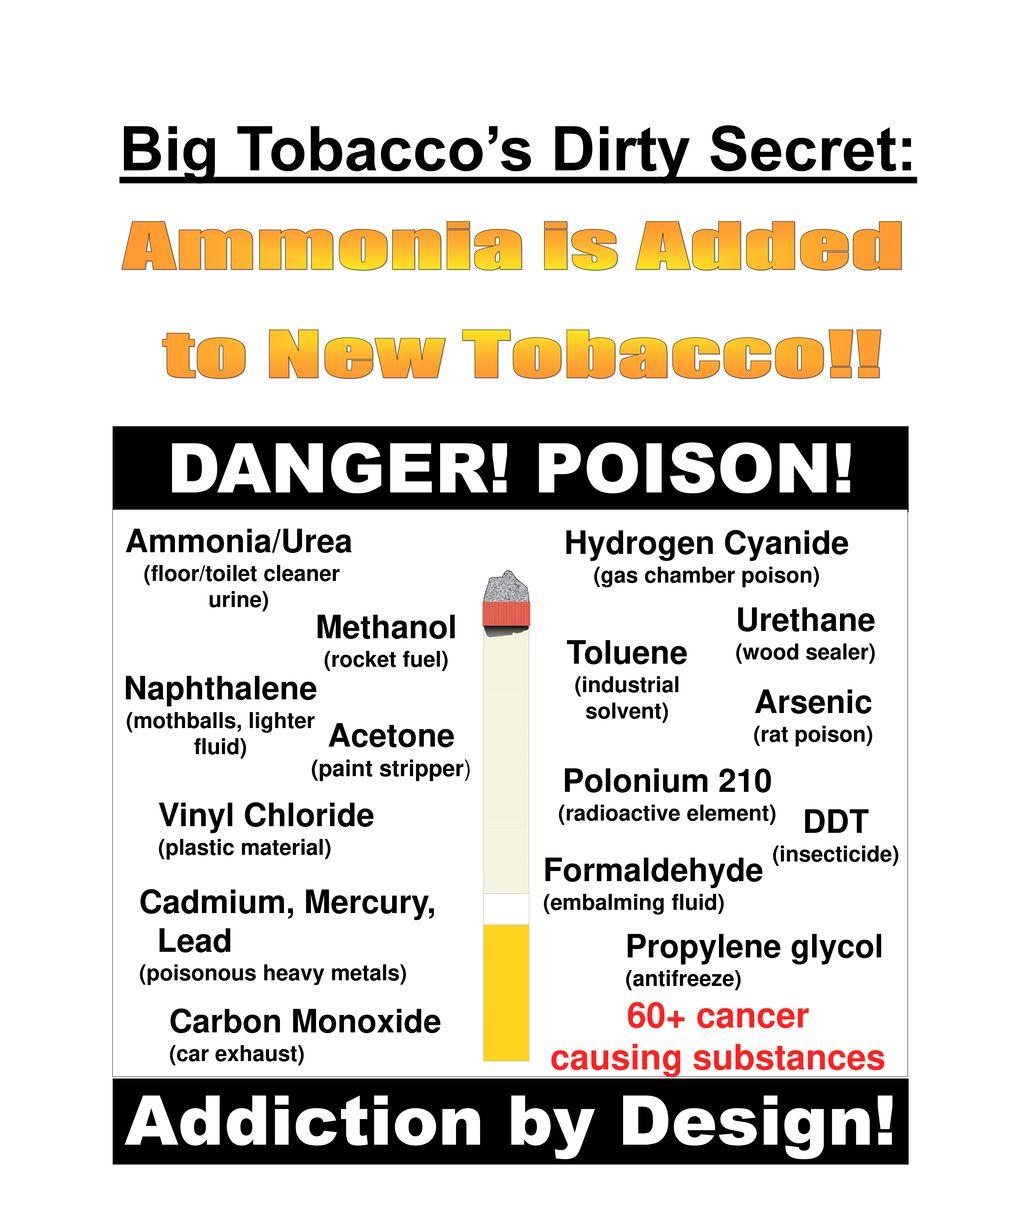 DANGER! POISON! Addiction by Design! Big Tobacco's Dirty Secret